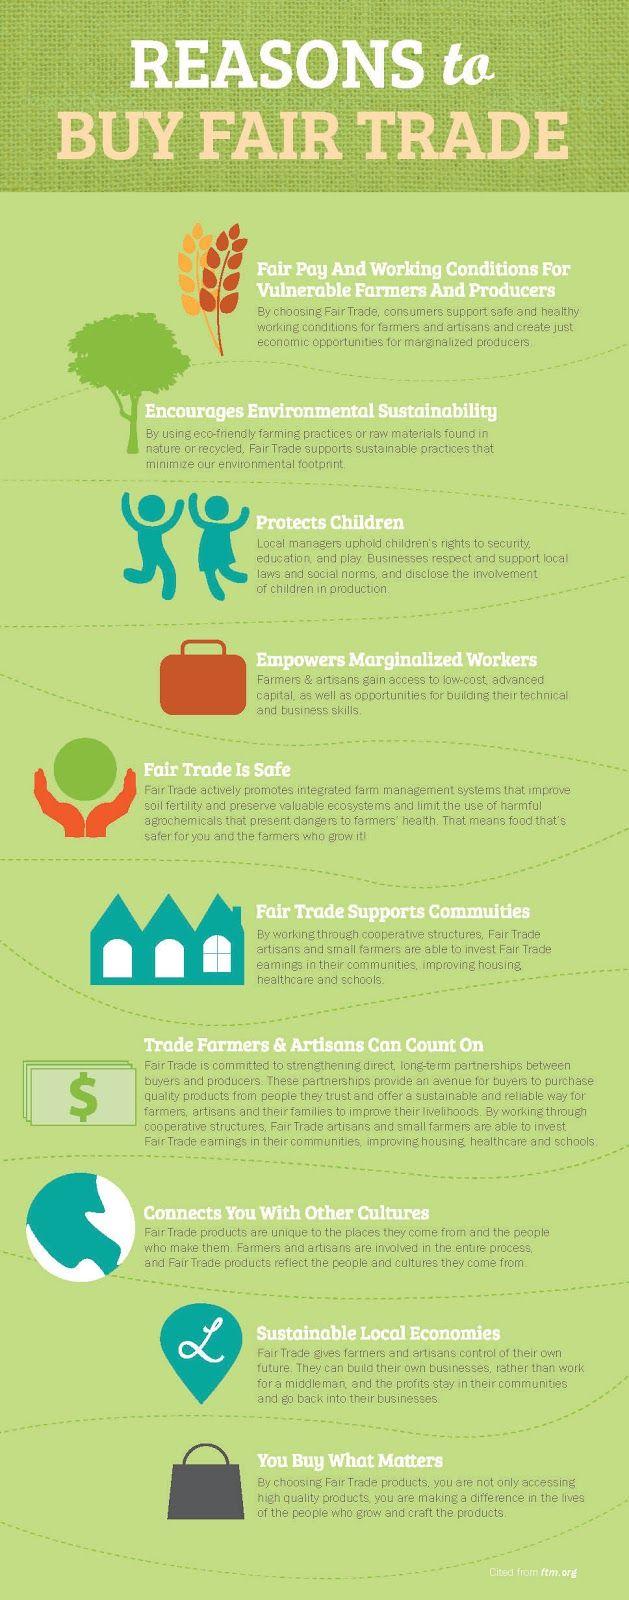 Powody dla których warto kupowac produkty Fair Trade.   Reasons to buy fair trade via Infographic... We like this very comprehensive list!